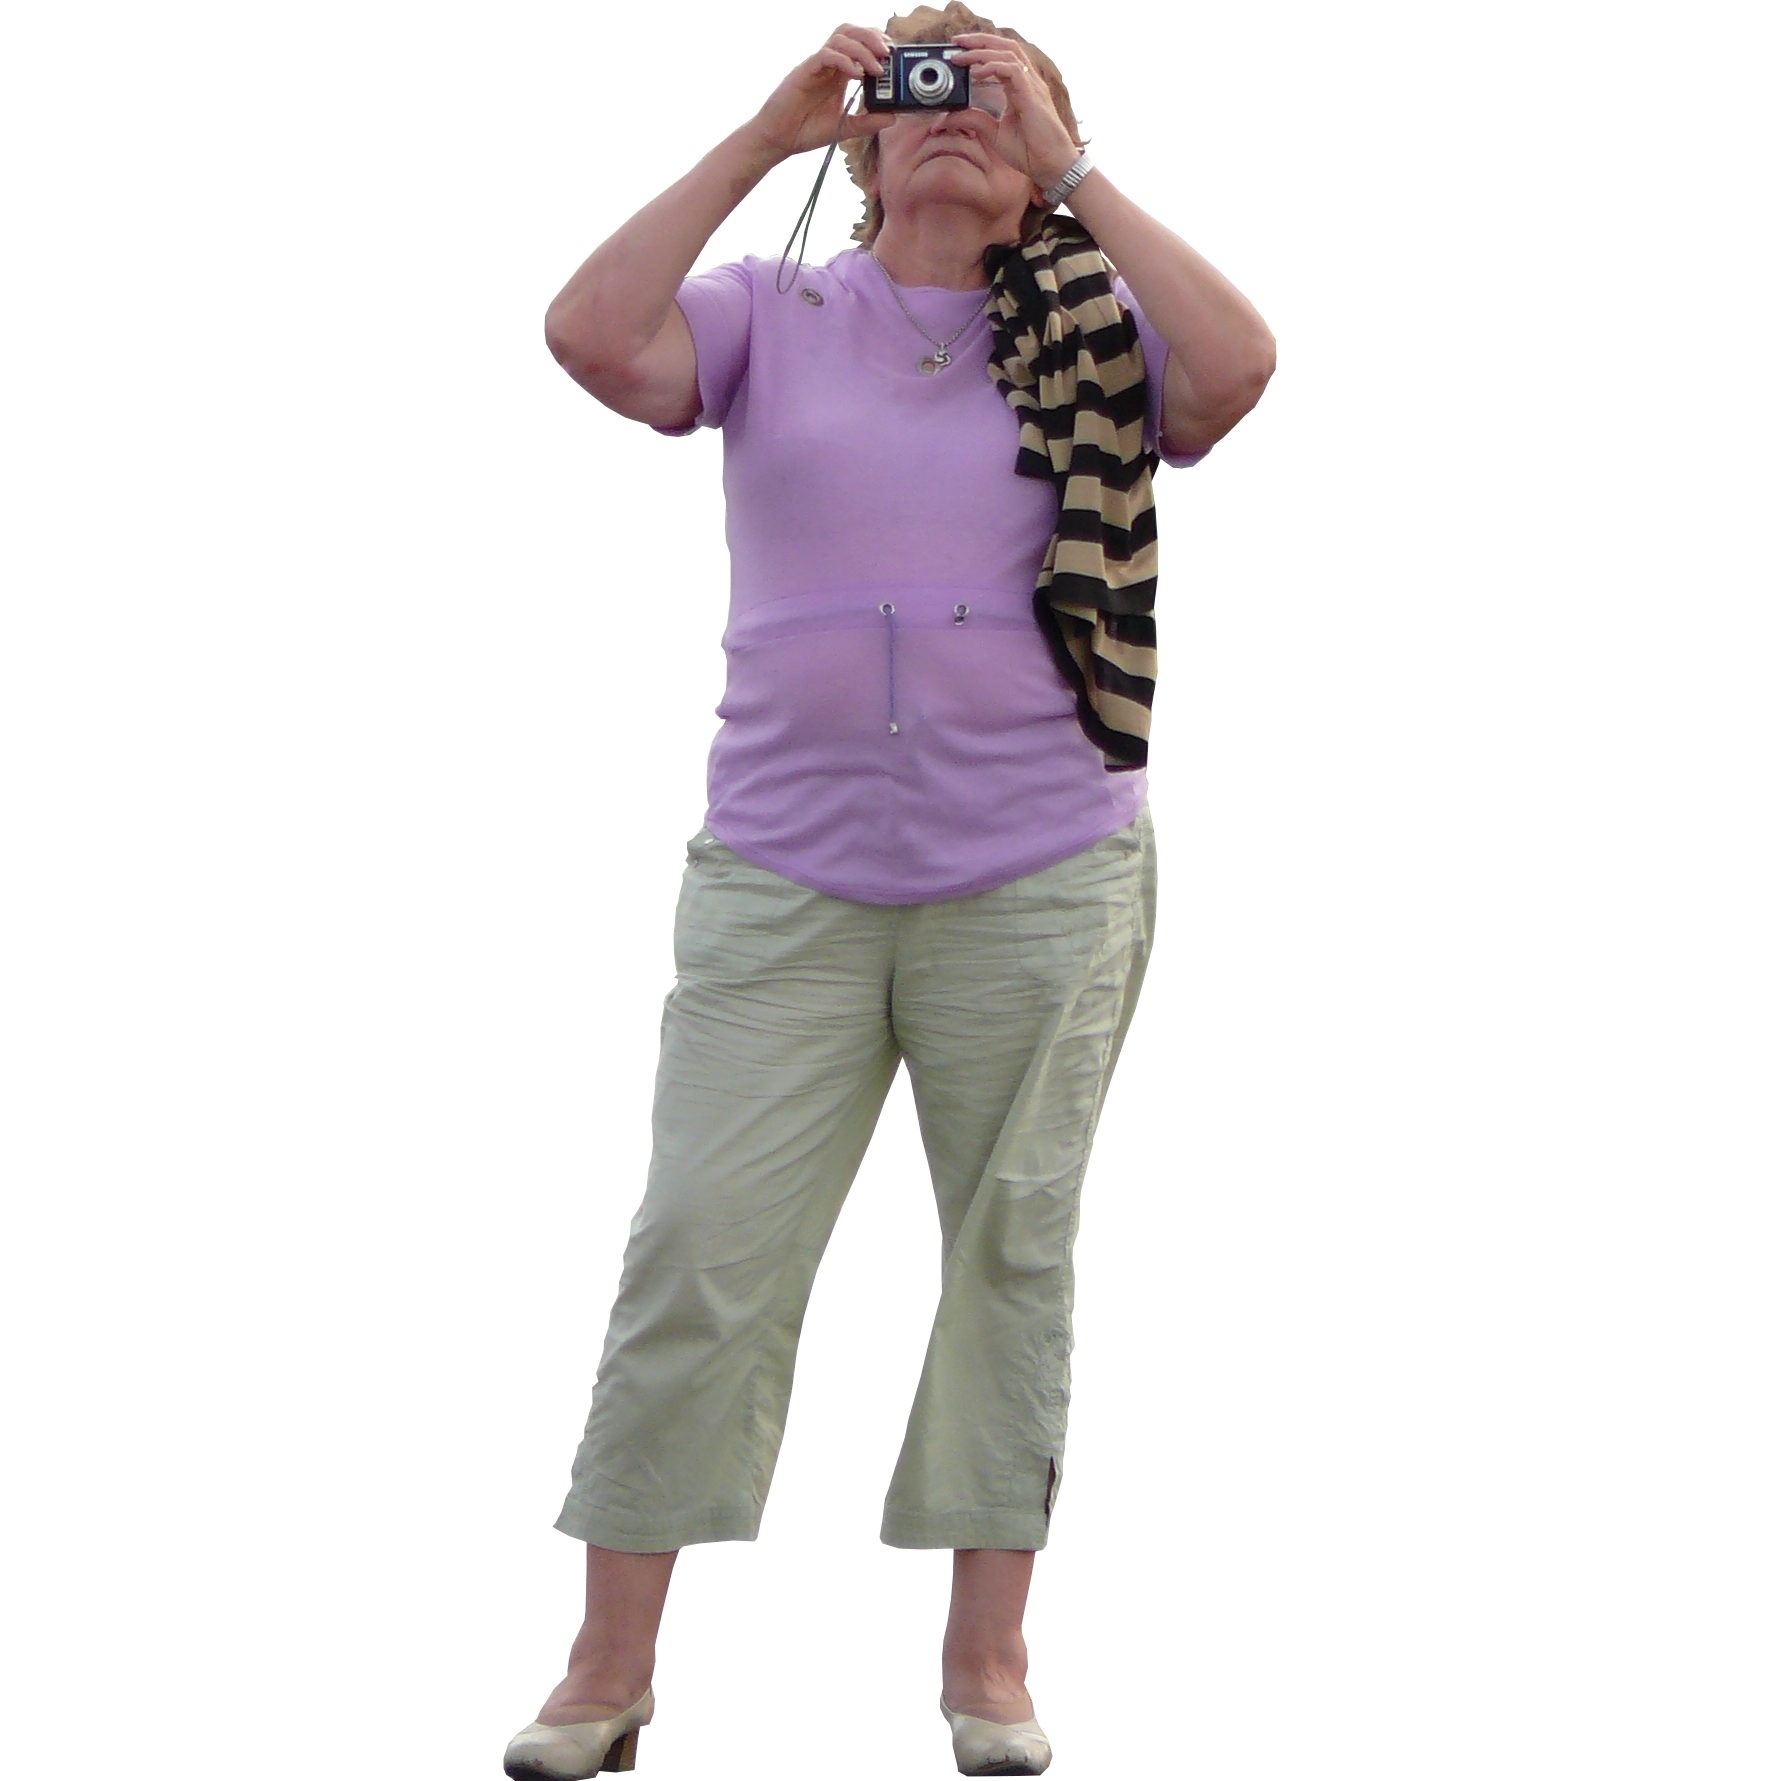 Imagenatives 0009 woman cutout photographer